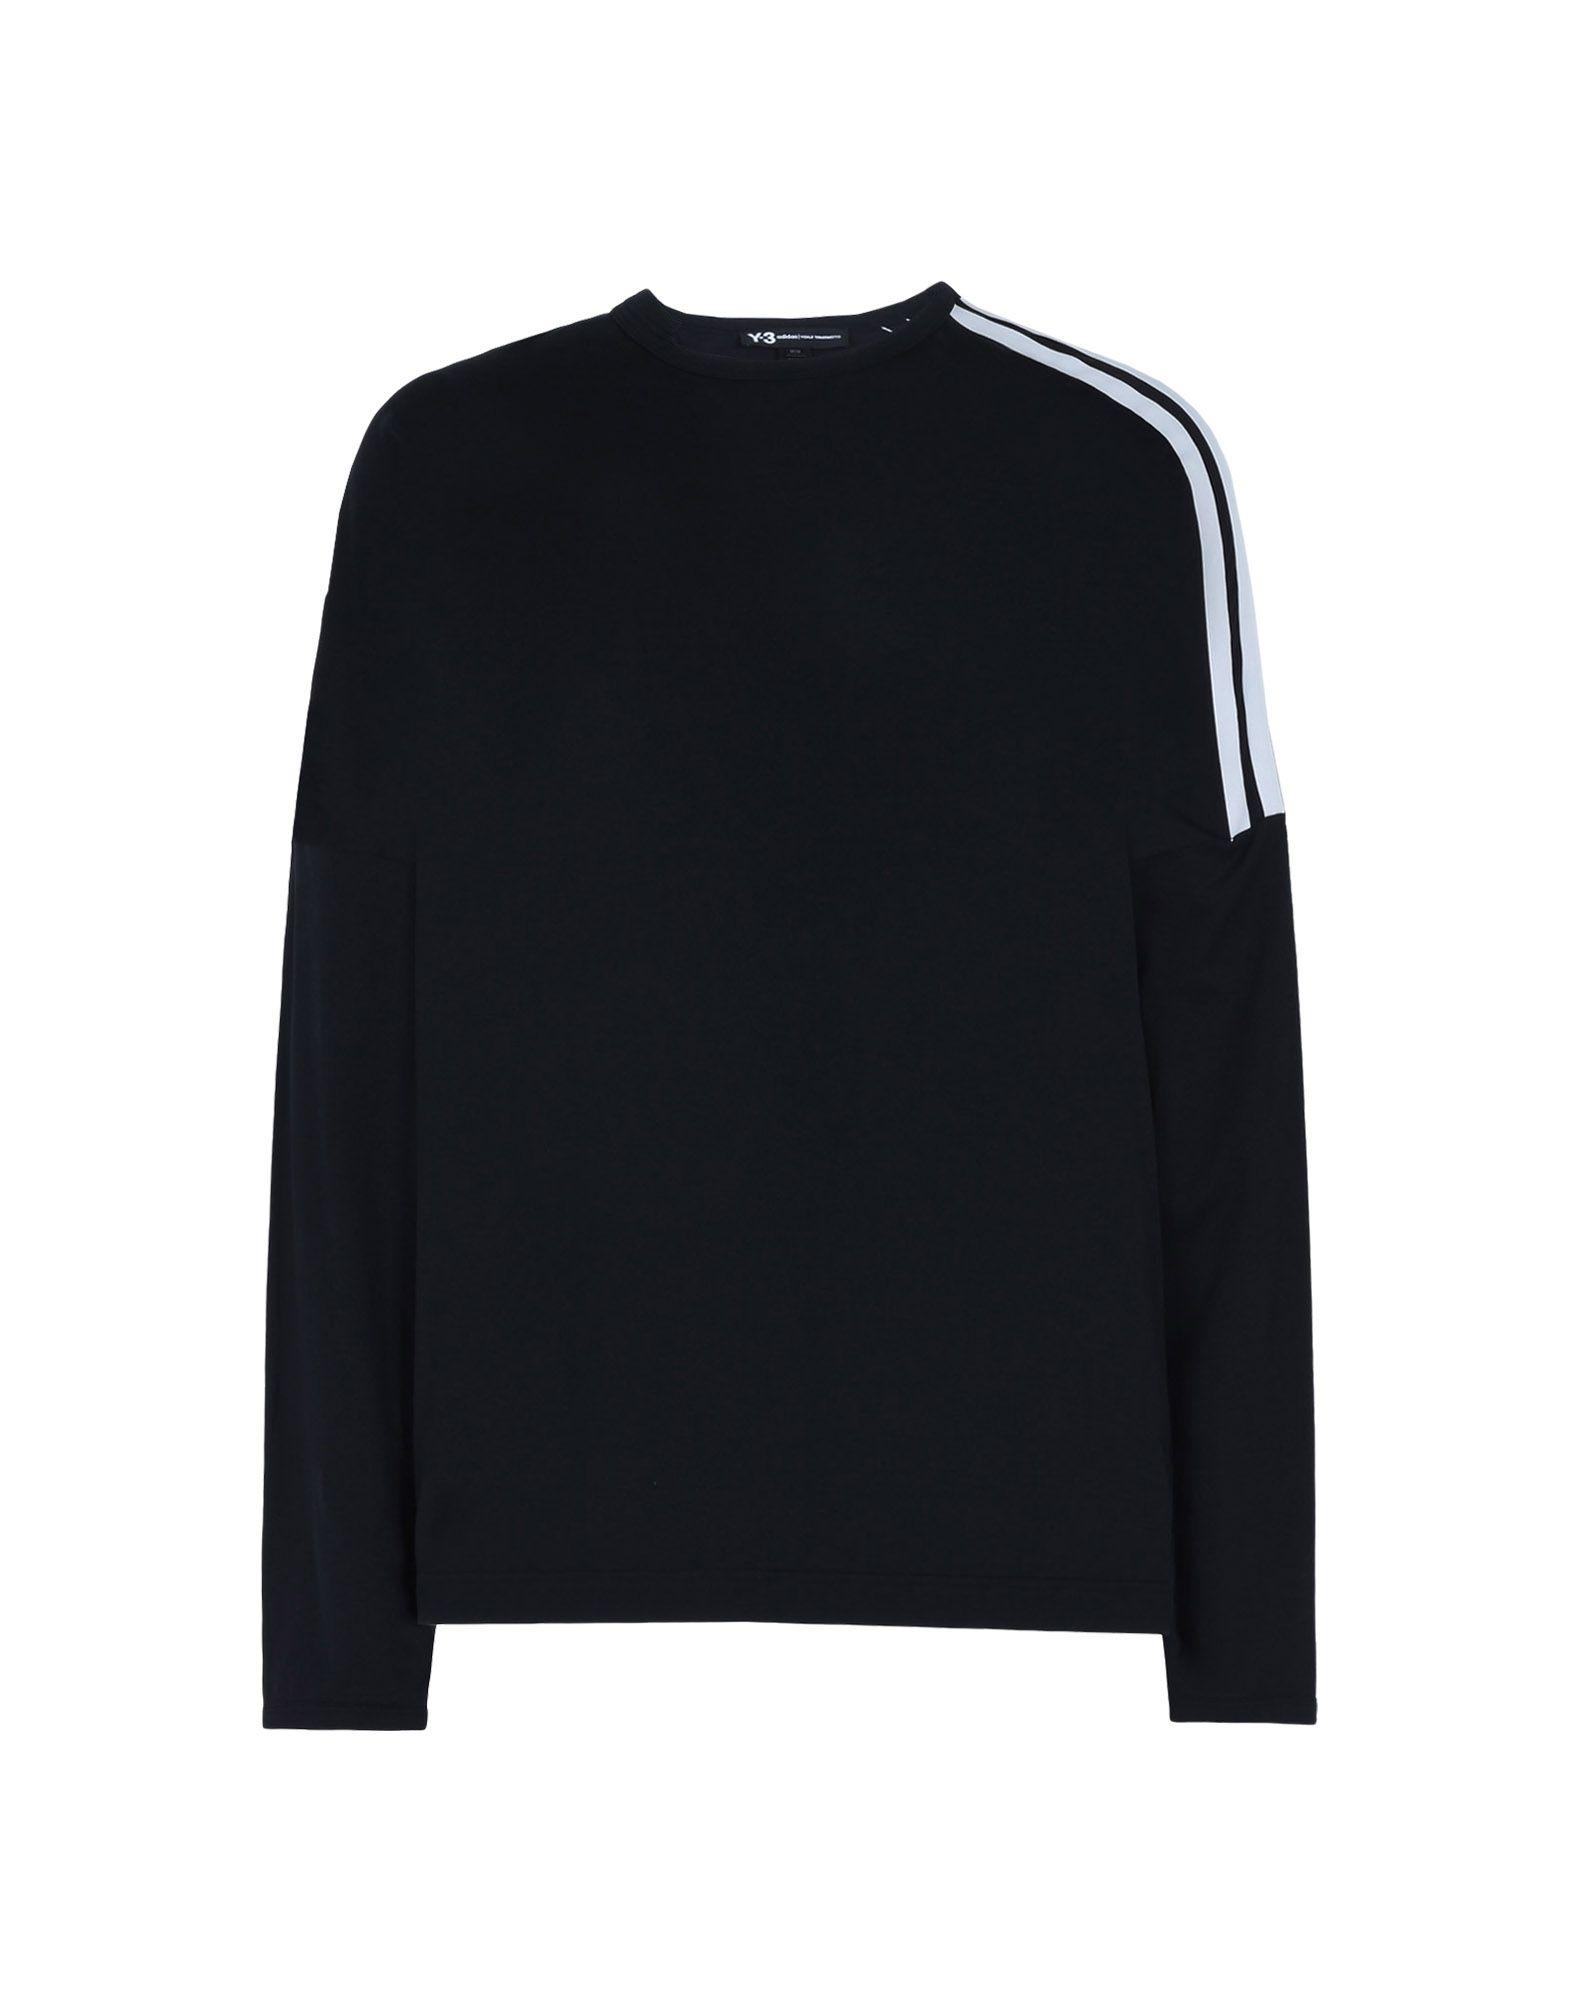 b673b9c1 Y 3 3 STRIPES TEE Long Sleeve t Shirts | Adidas Y-3 Official Site